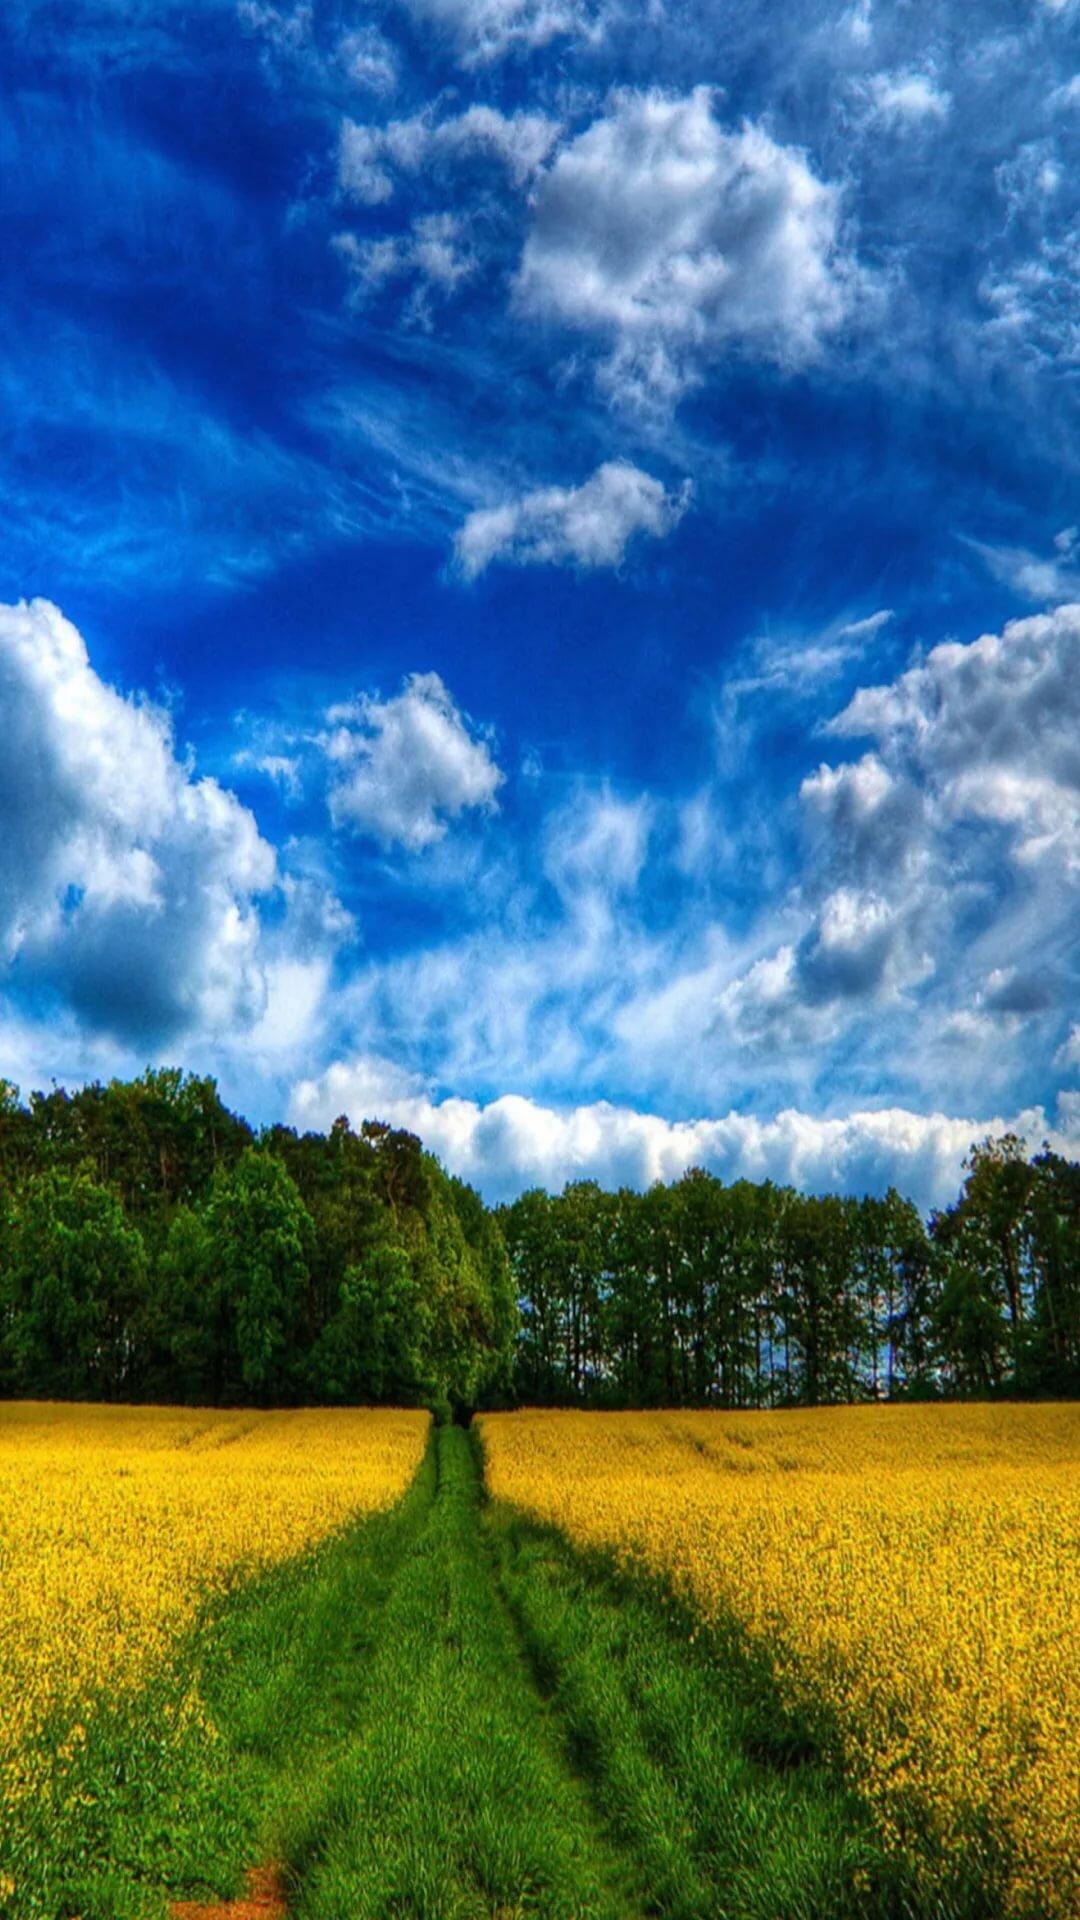 Природа балашова фото период июня